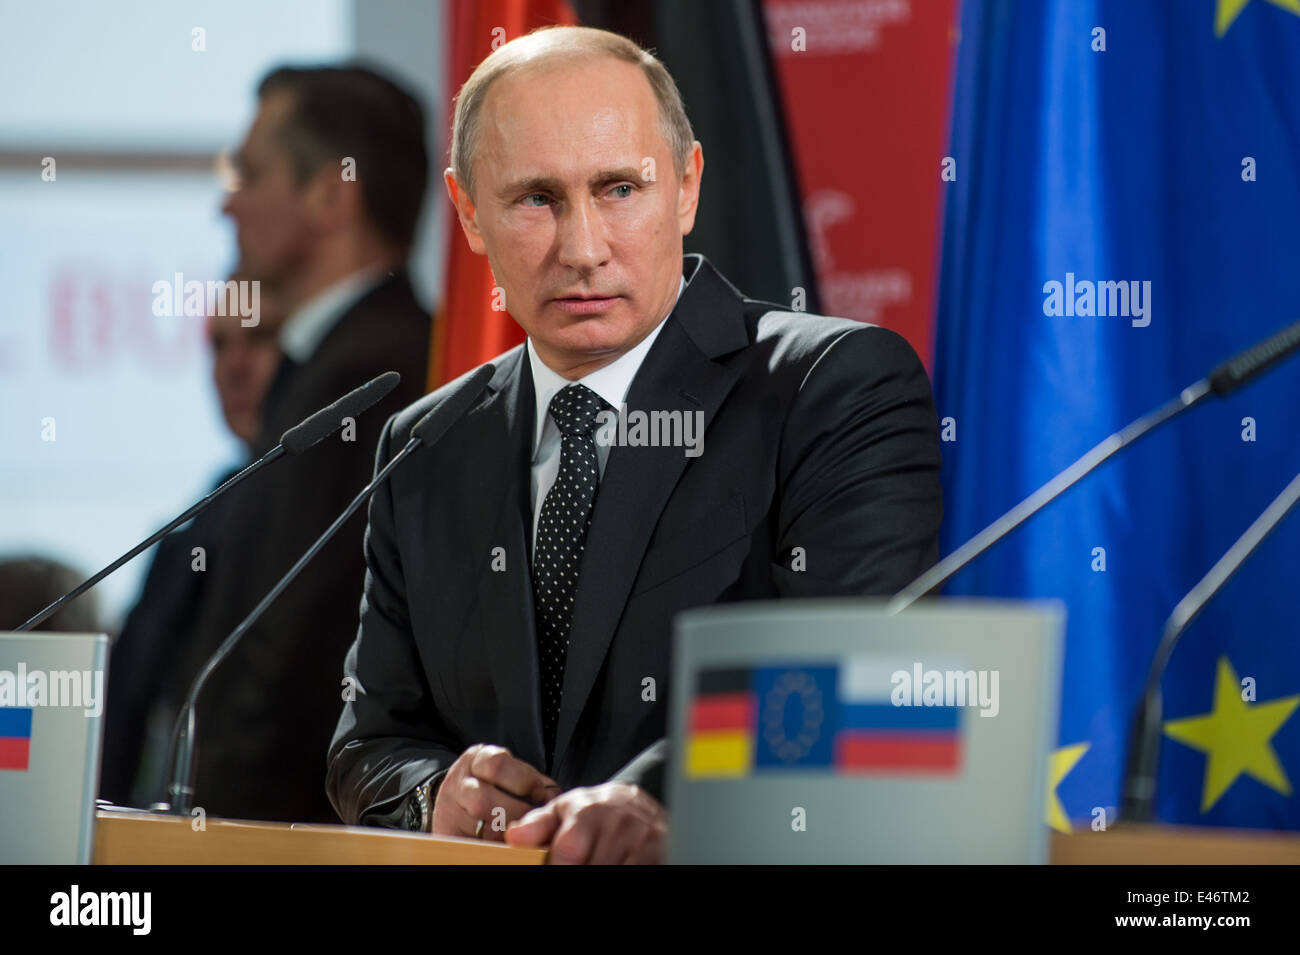 Vladimir Putin, President of the Russian Federation 88